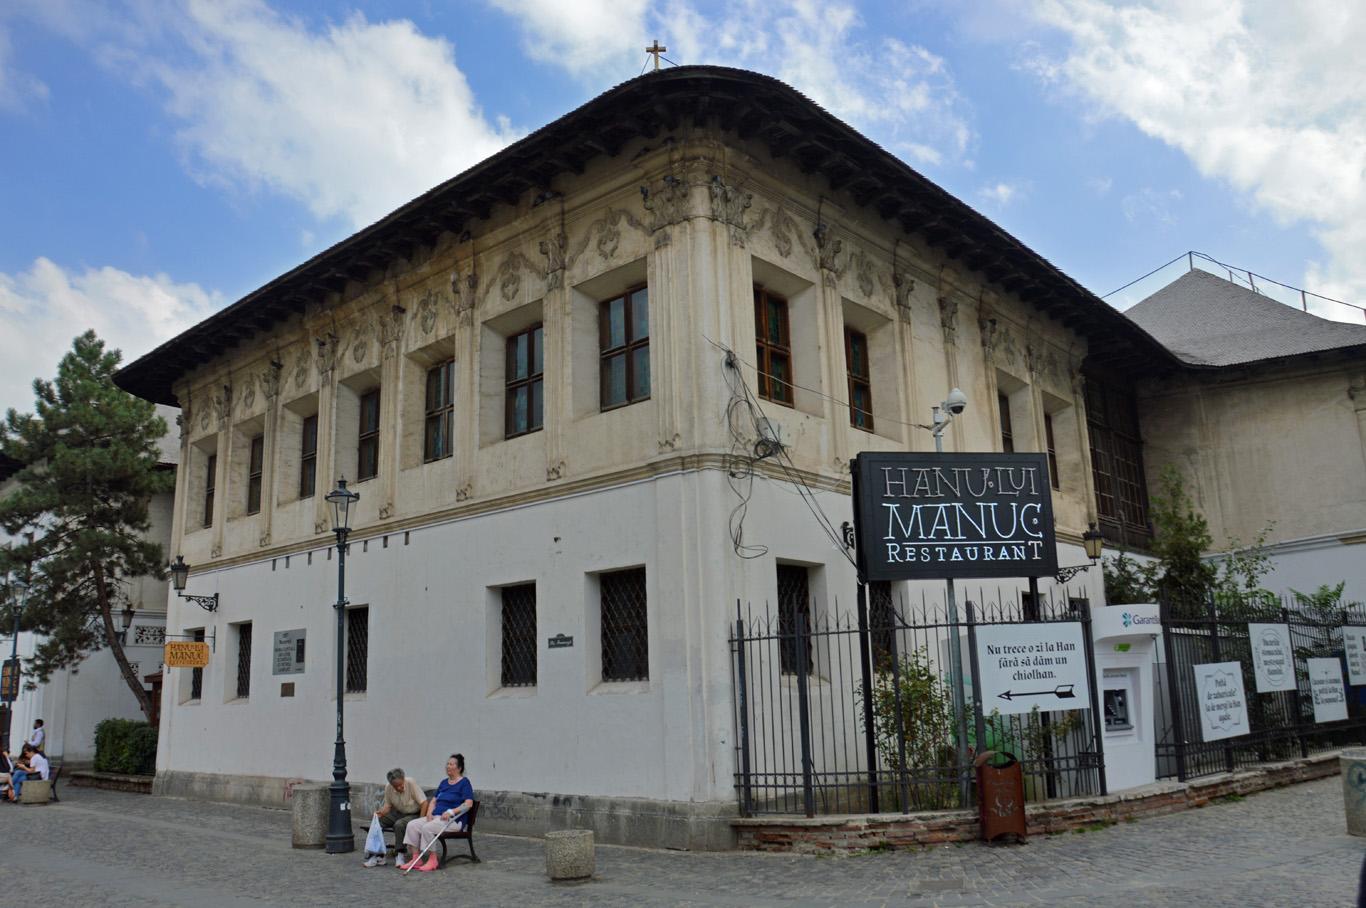 Museum near Cortea Veche